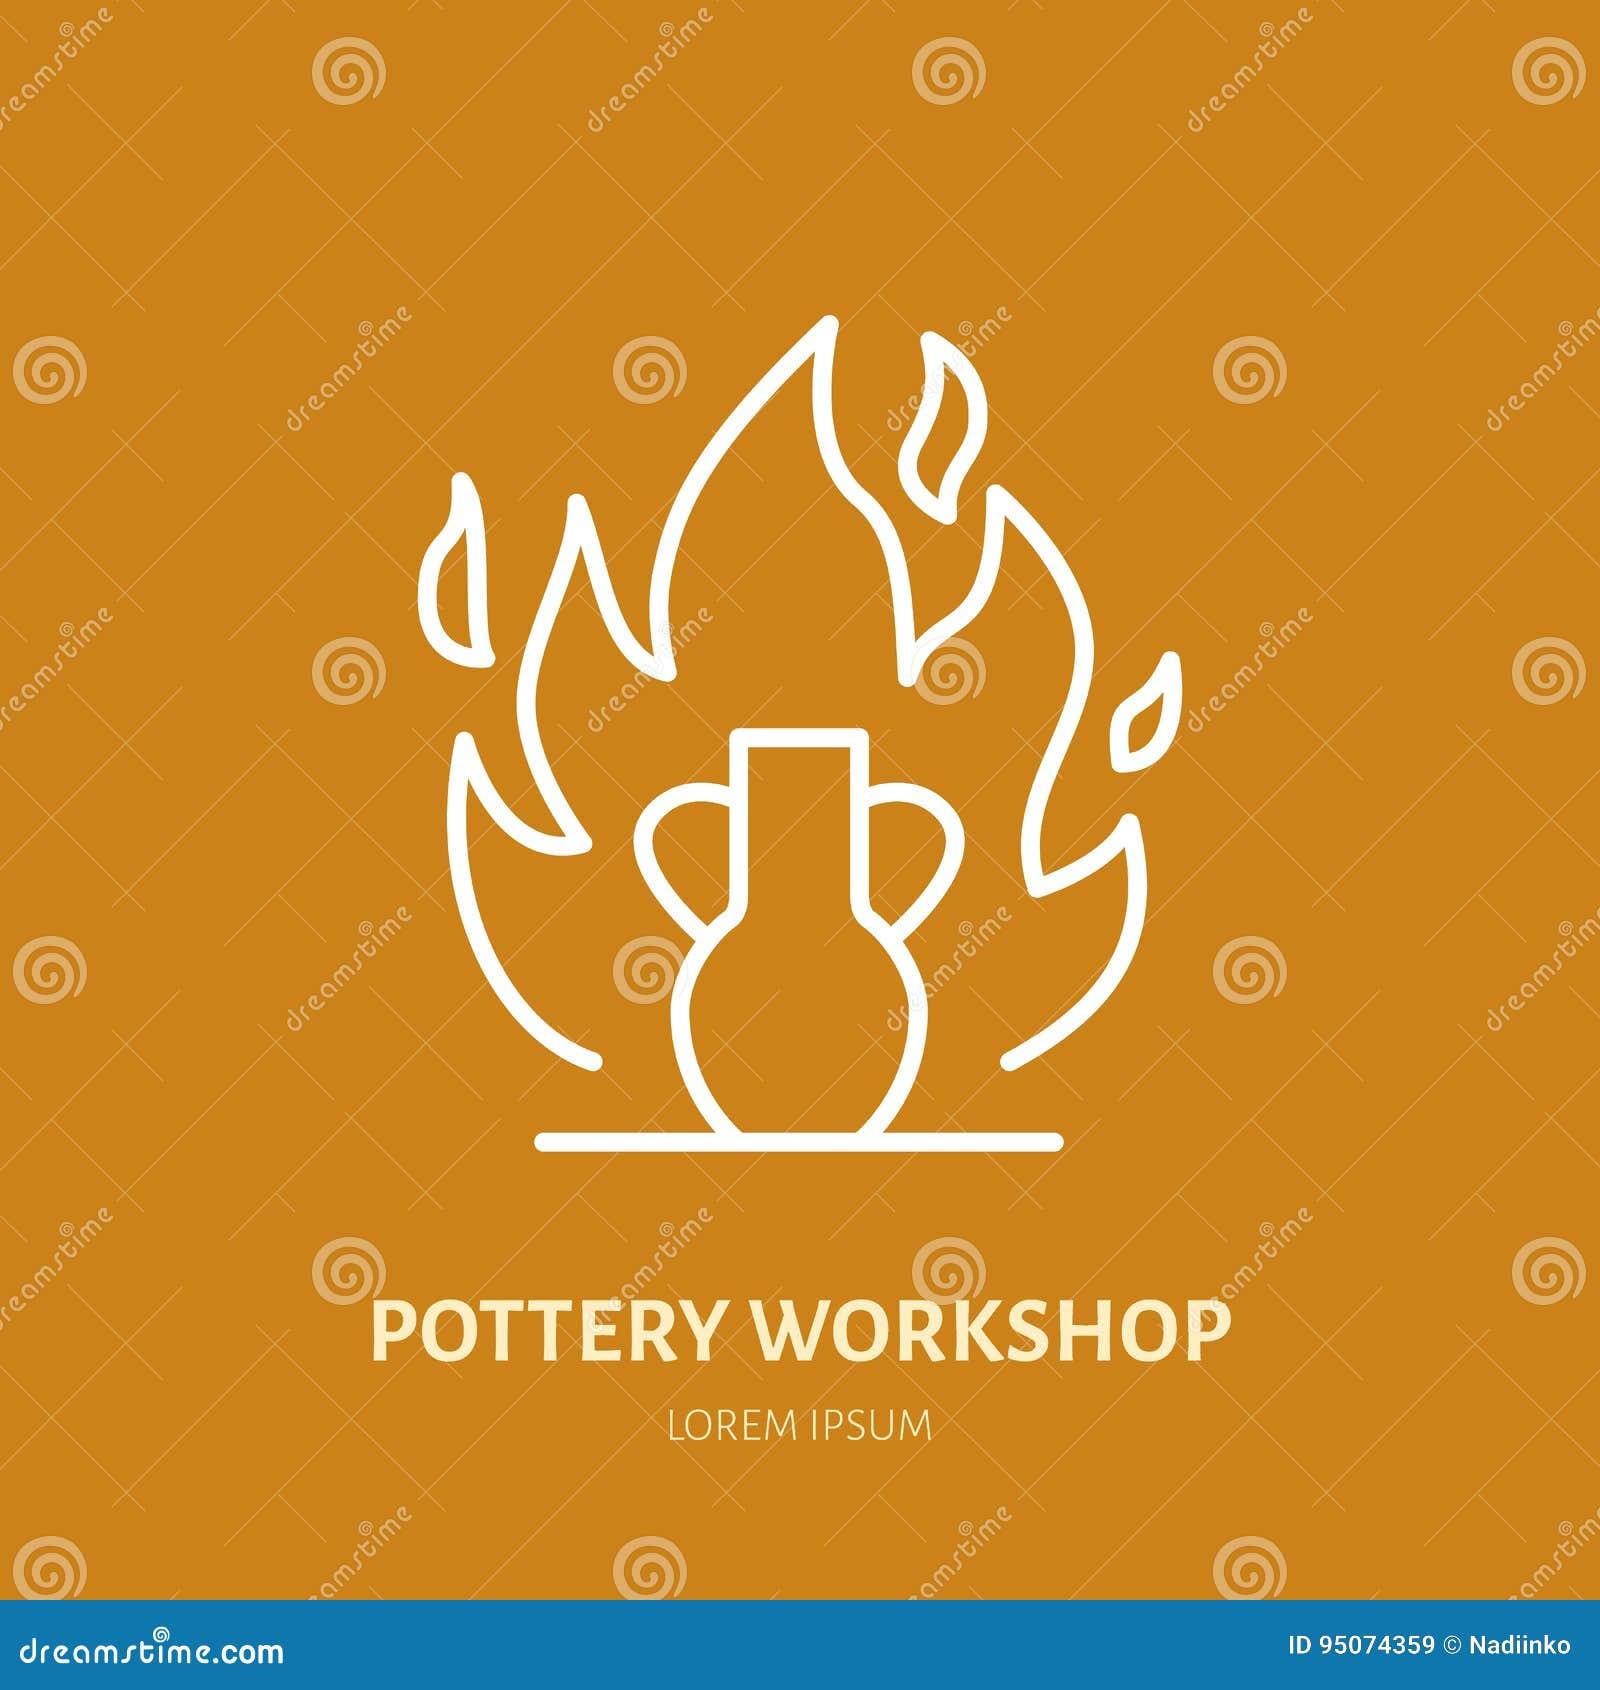 Pottery workshop, ceramics classes line icon. Clay studio tools sign. Hand building, sculpturing equipment shop sign